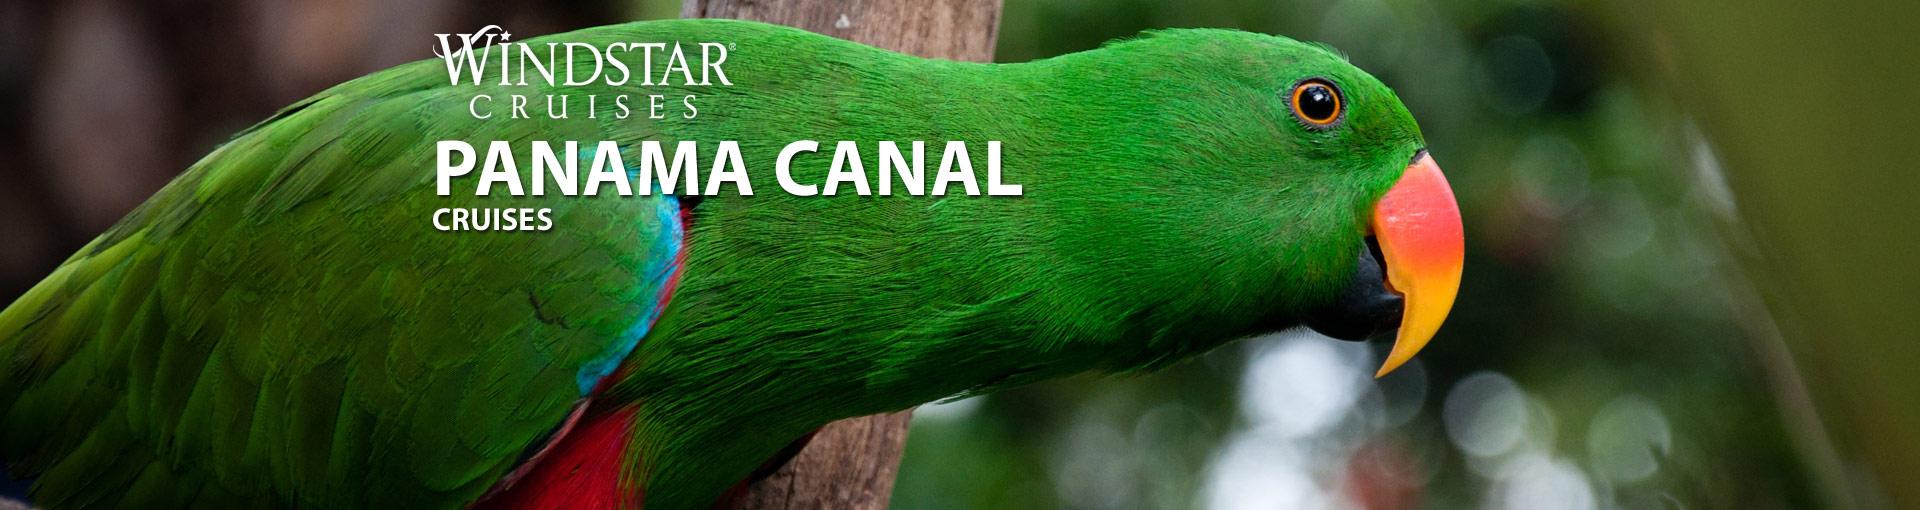 Windstar Panama Canal Cruises